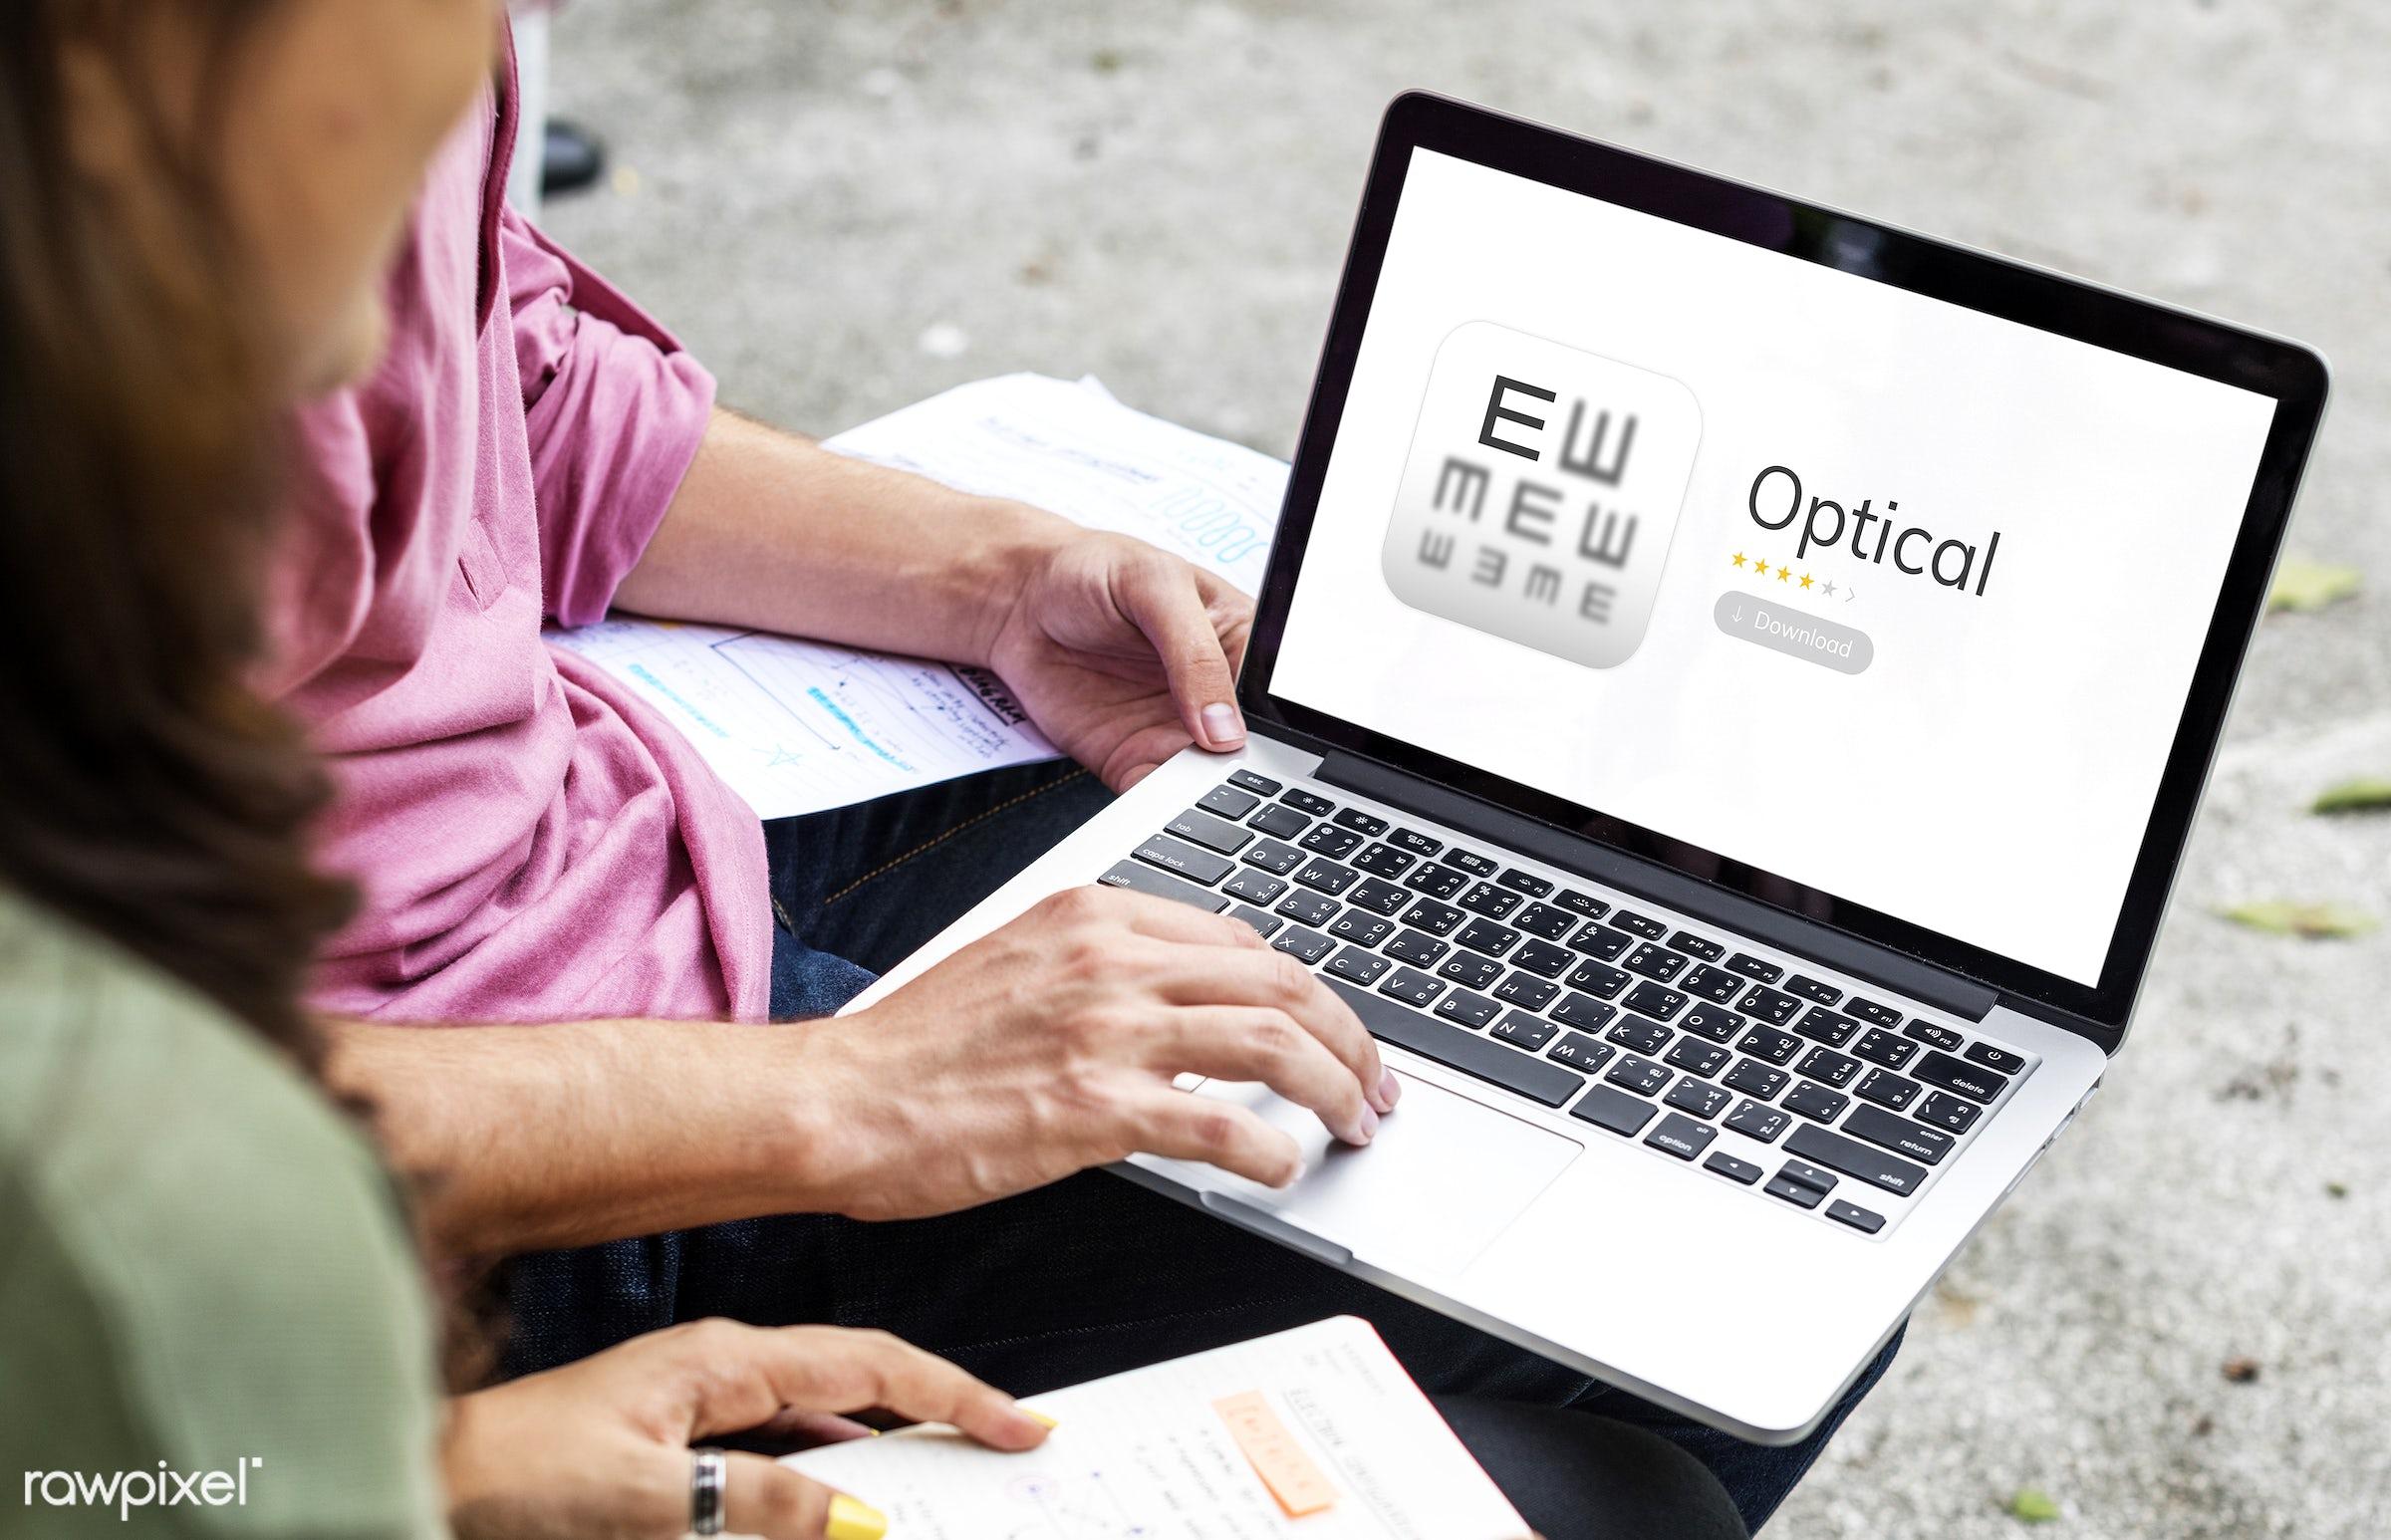 asian, browsing, business, care, caucasian, consultation, devices, digital, diversity, enjoyment, equipment, eye, eyesight,...